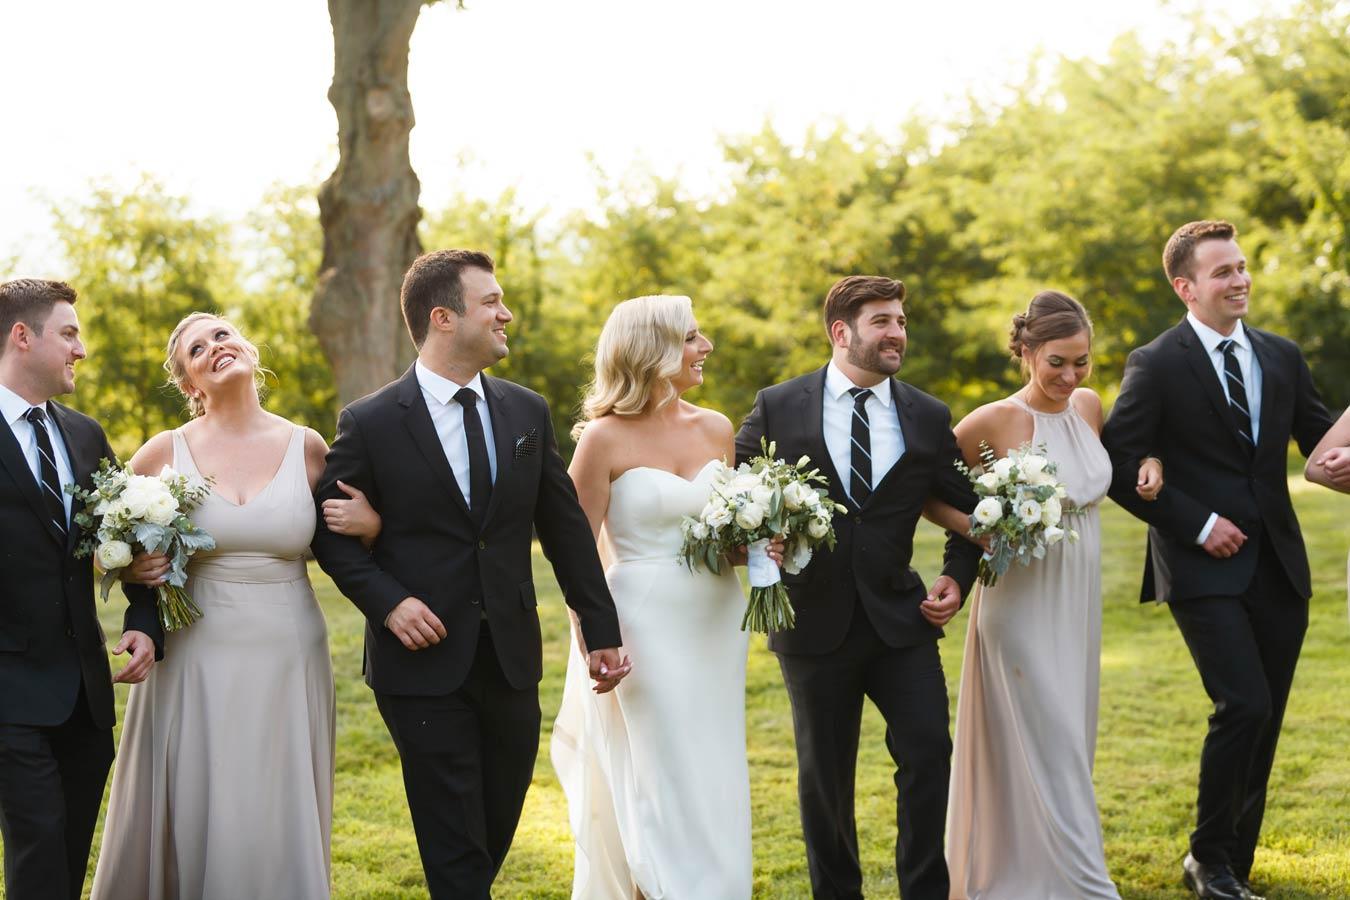 monterverde-oldtone-manor-westchester-wedding-photogrpher0026.jpg